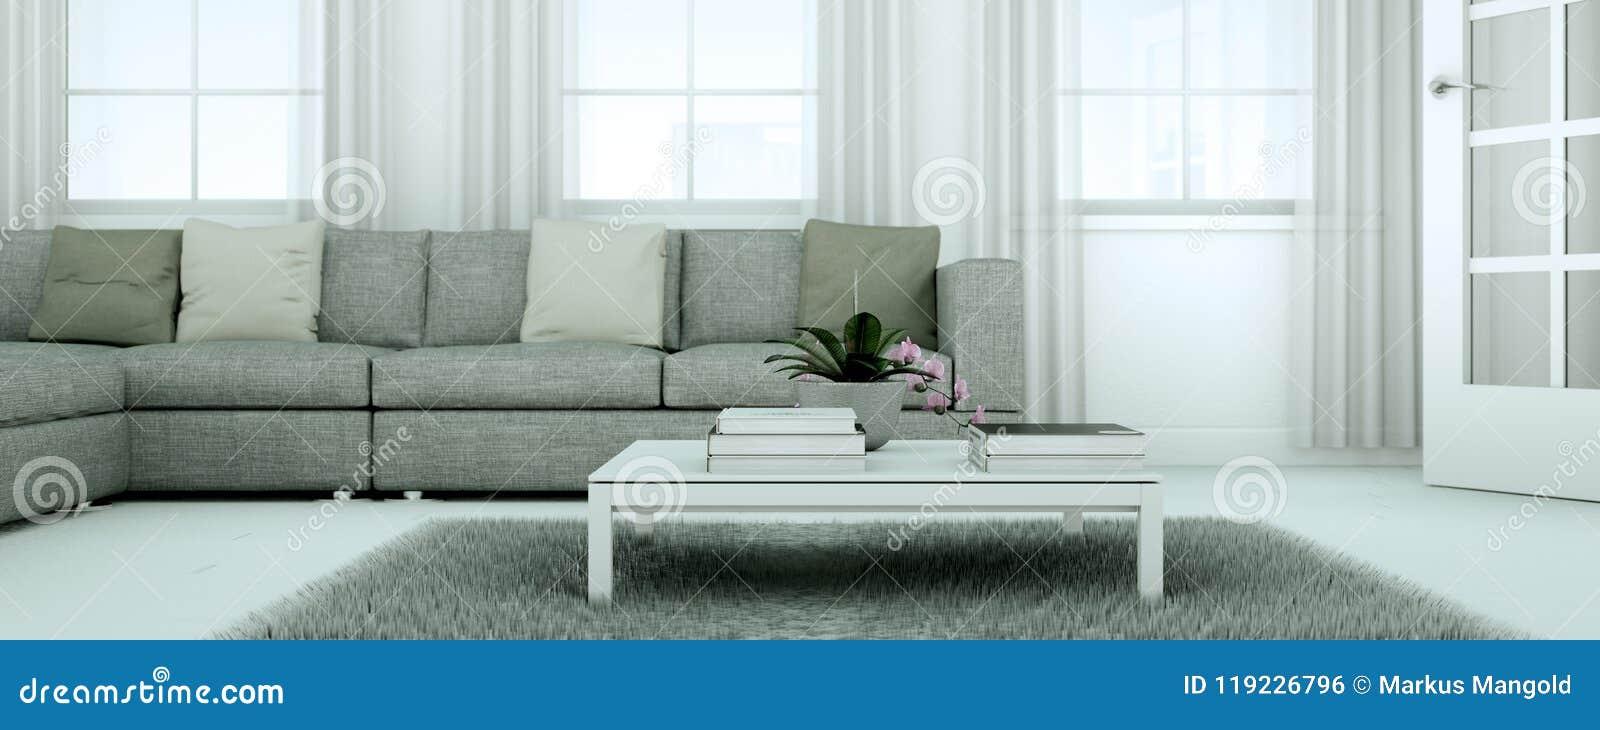 Appartement skandinavian lumineux moderne de conception intérieure